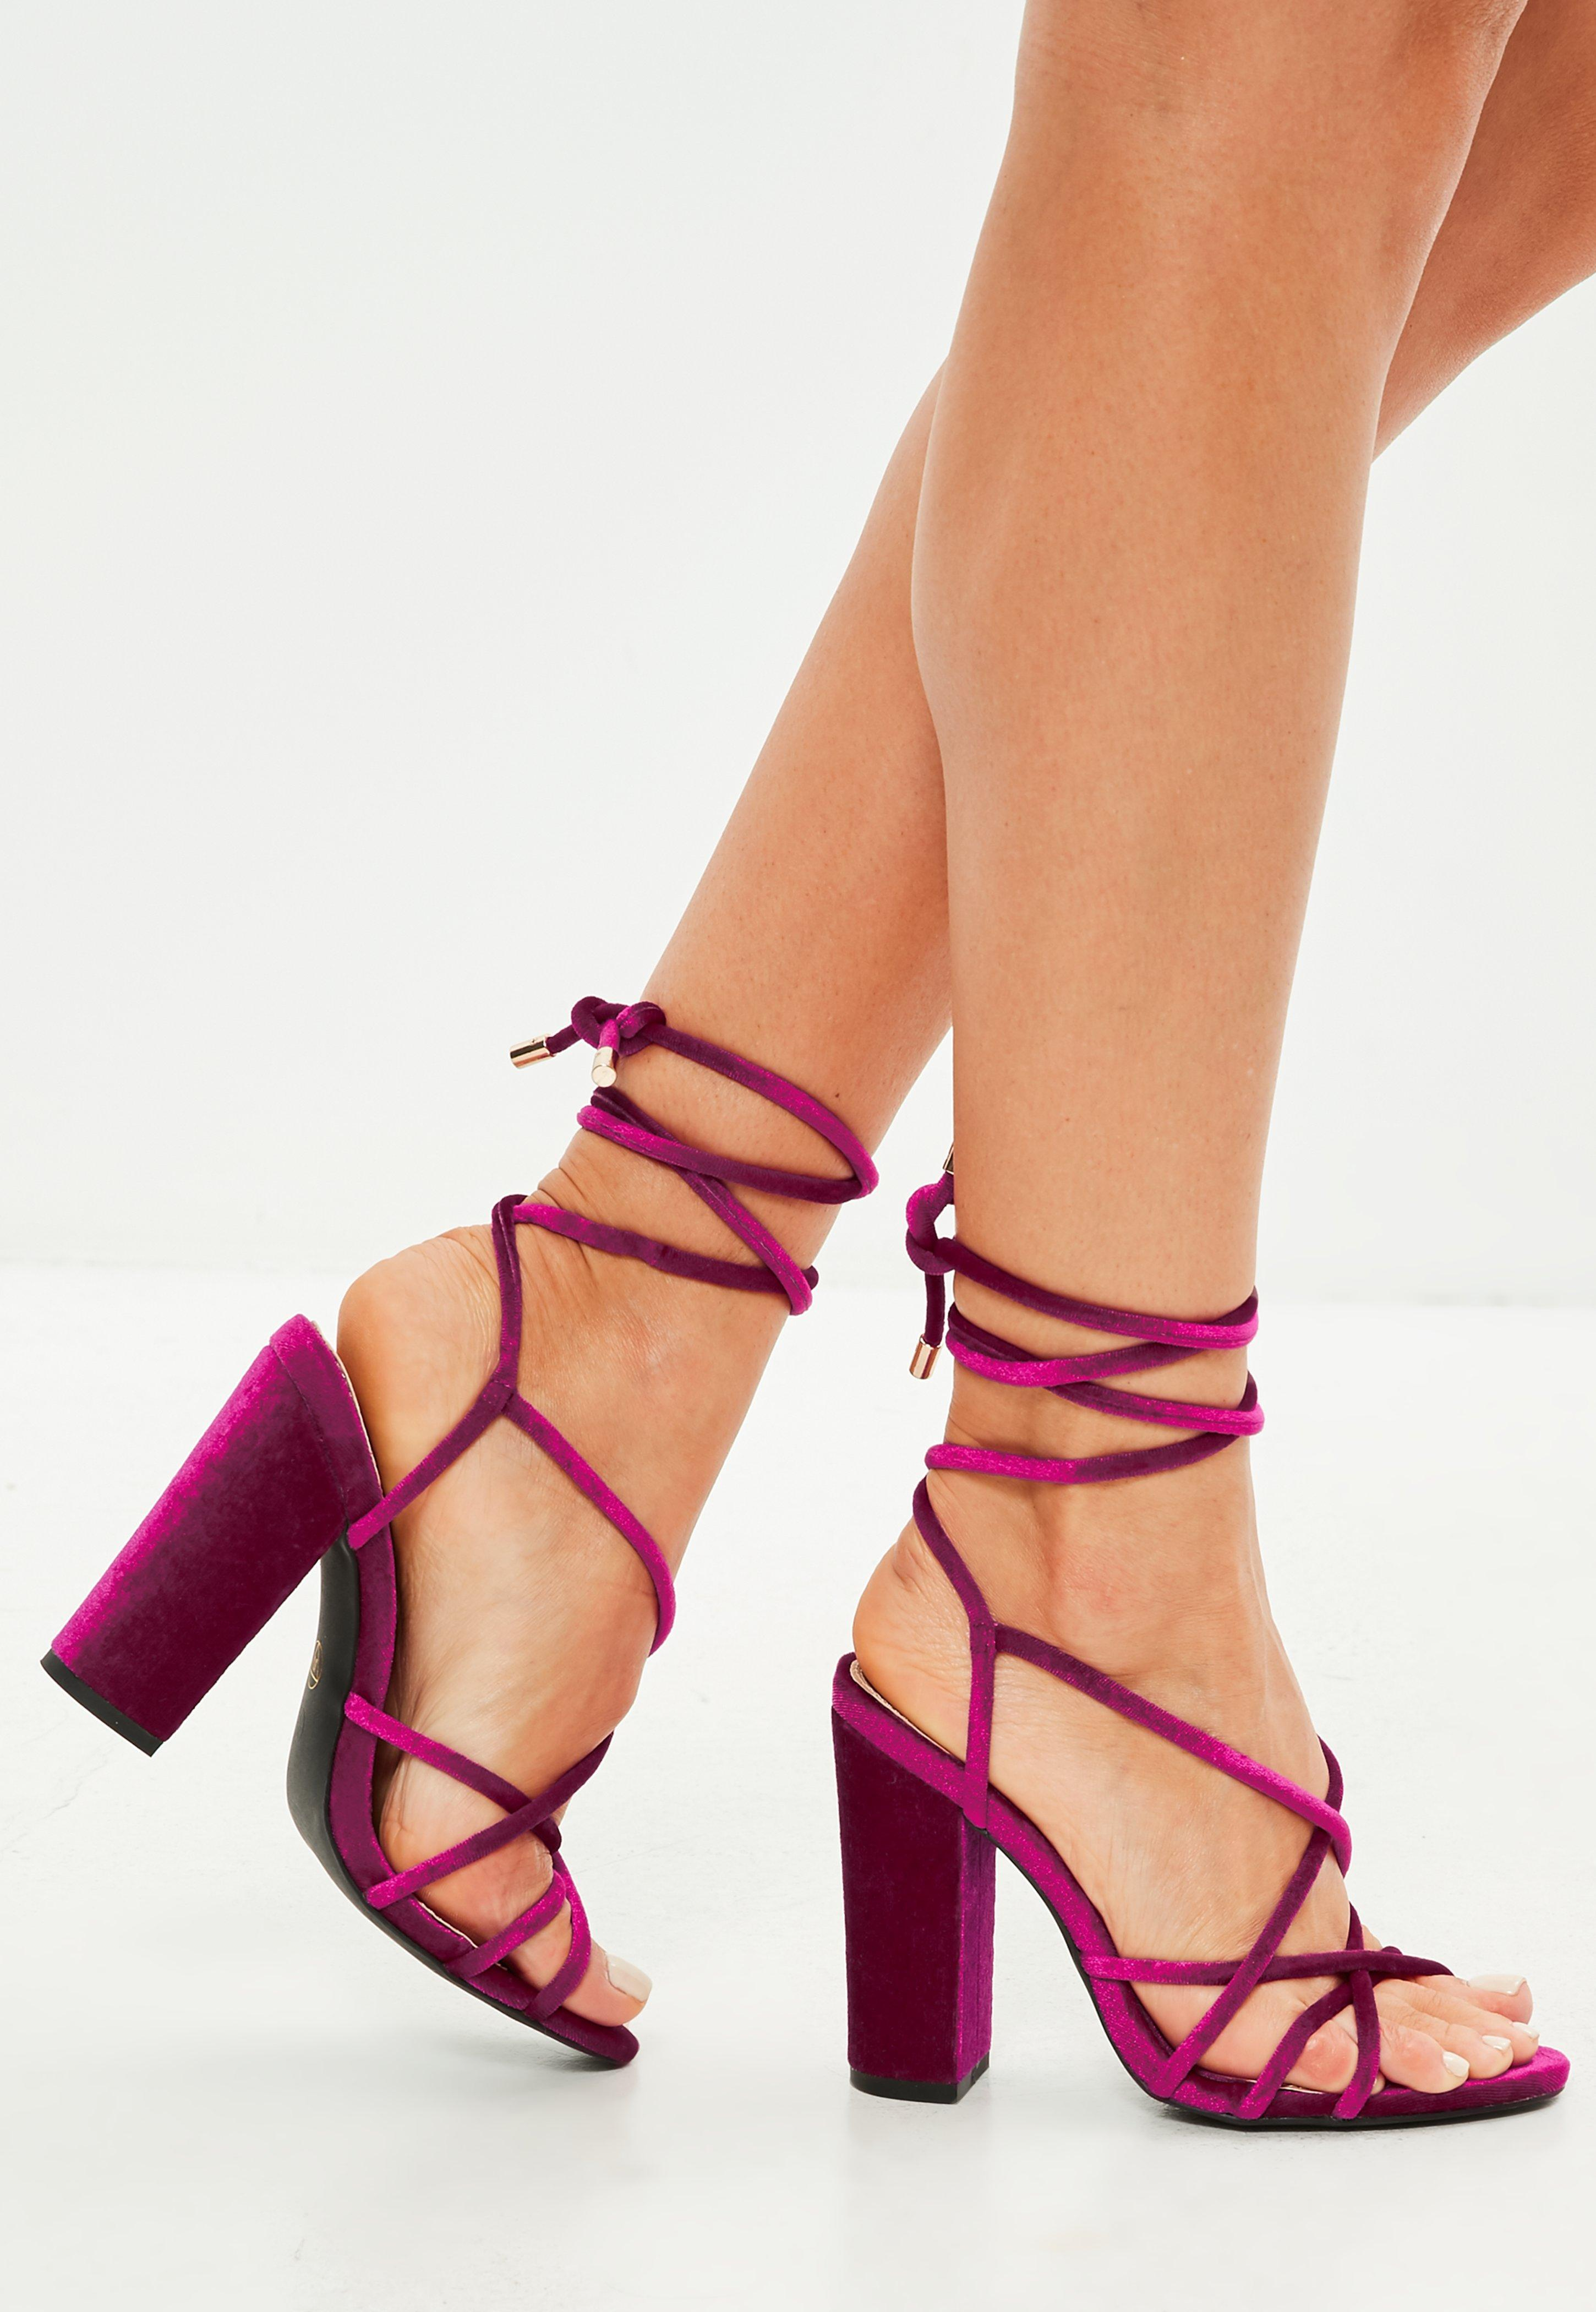 2b7f0efe59e Lyst - Missguided Pink Velvet Multi Strap Block Heel Sandals in Pink